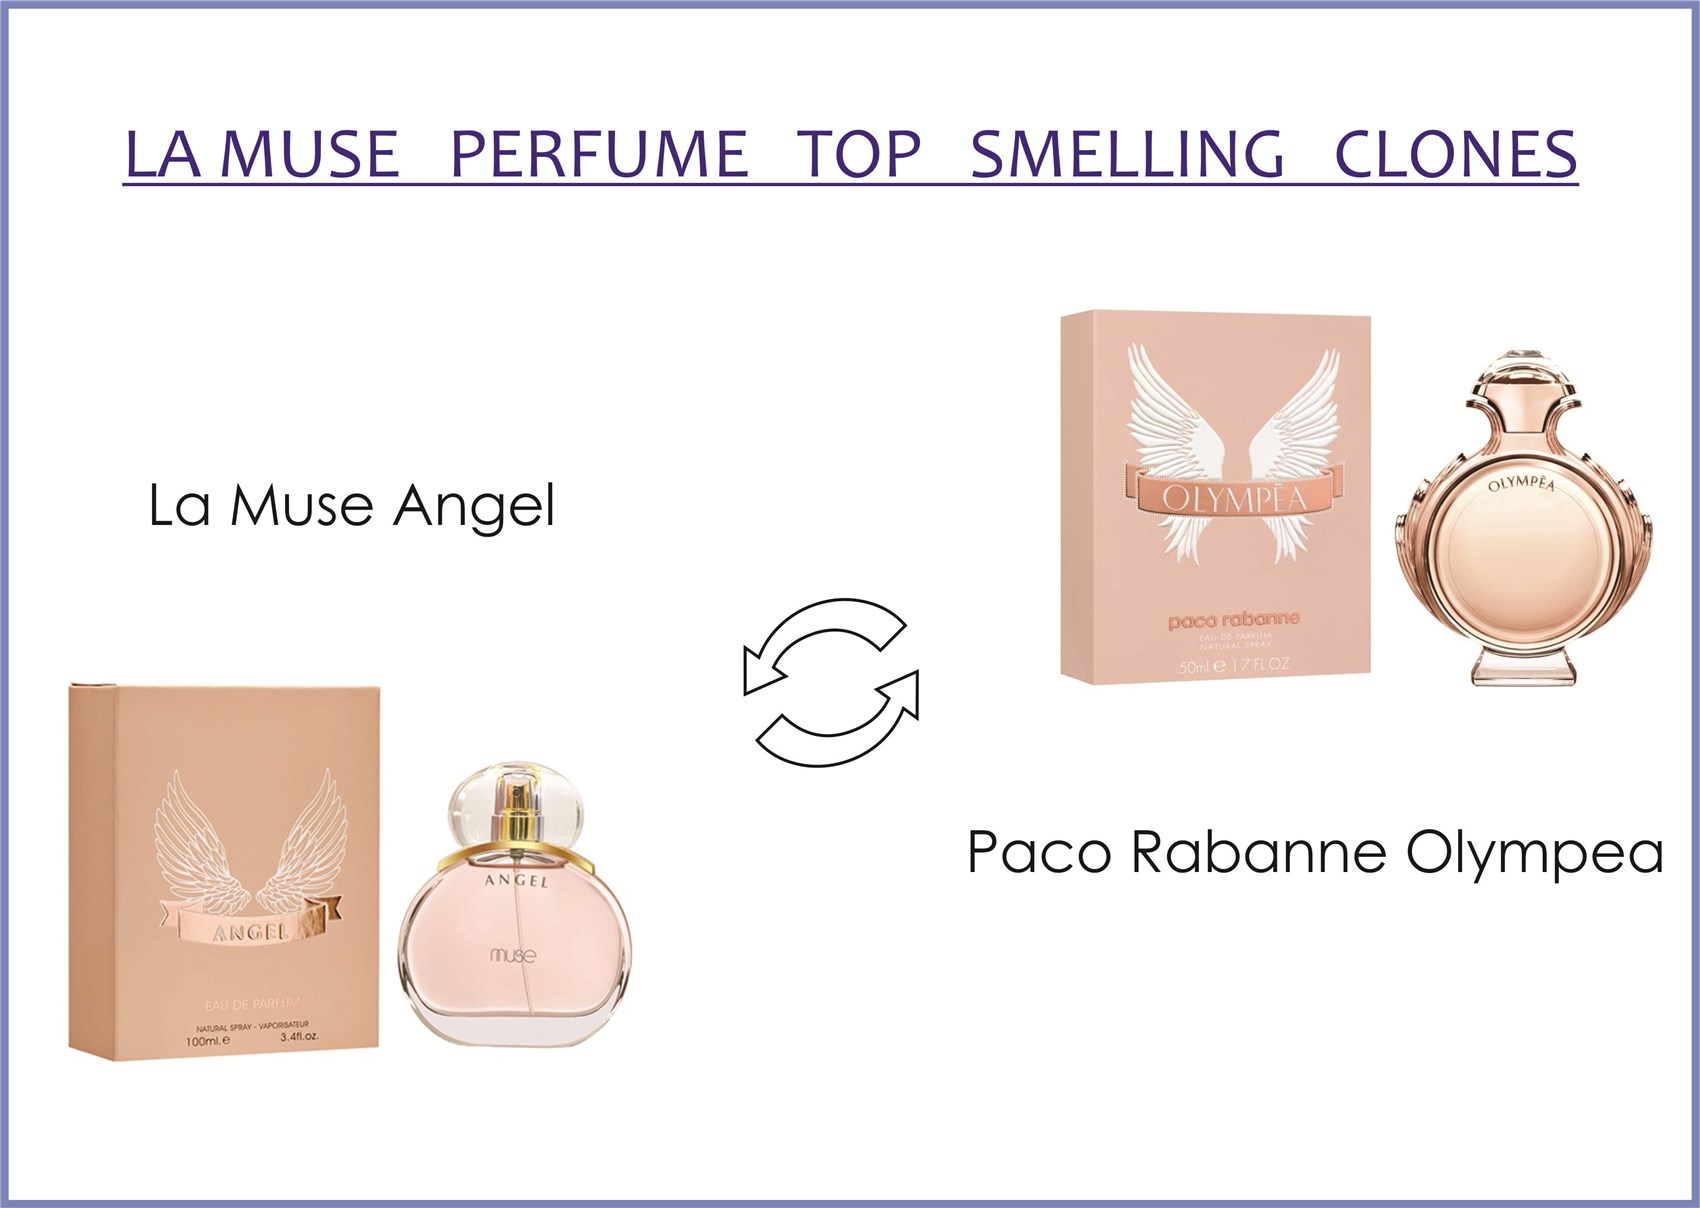 la-muse-perfumes-paco-rabanne-olympea-perfume-for-women-80-ml-edp